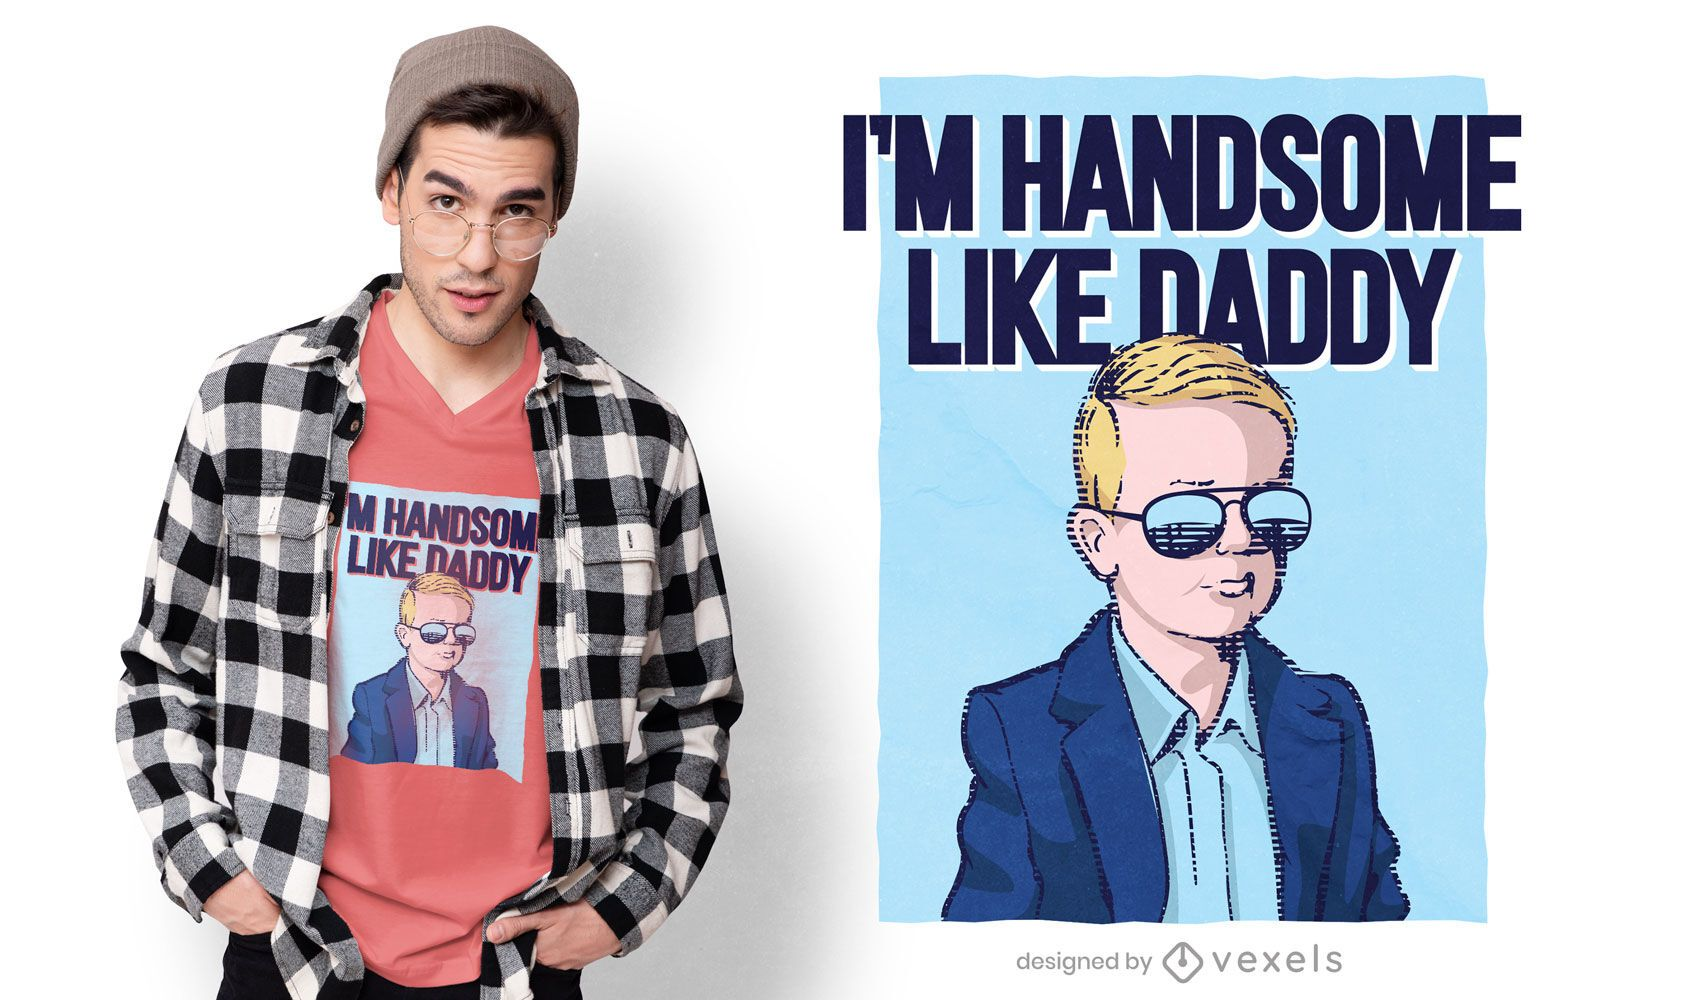 Handsome like daddy t-shirt design